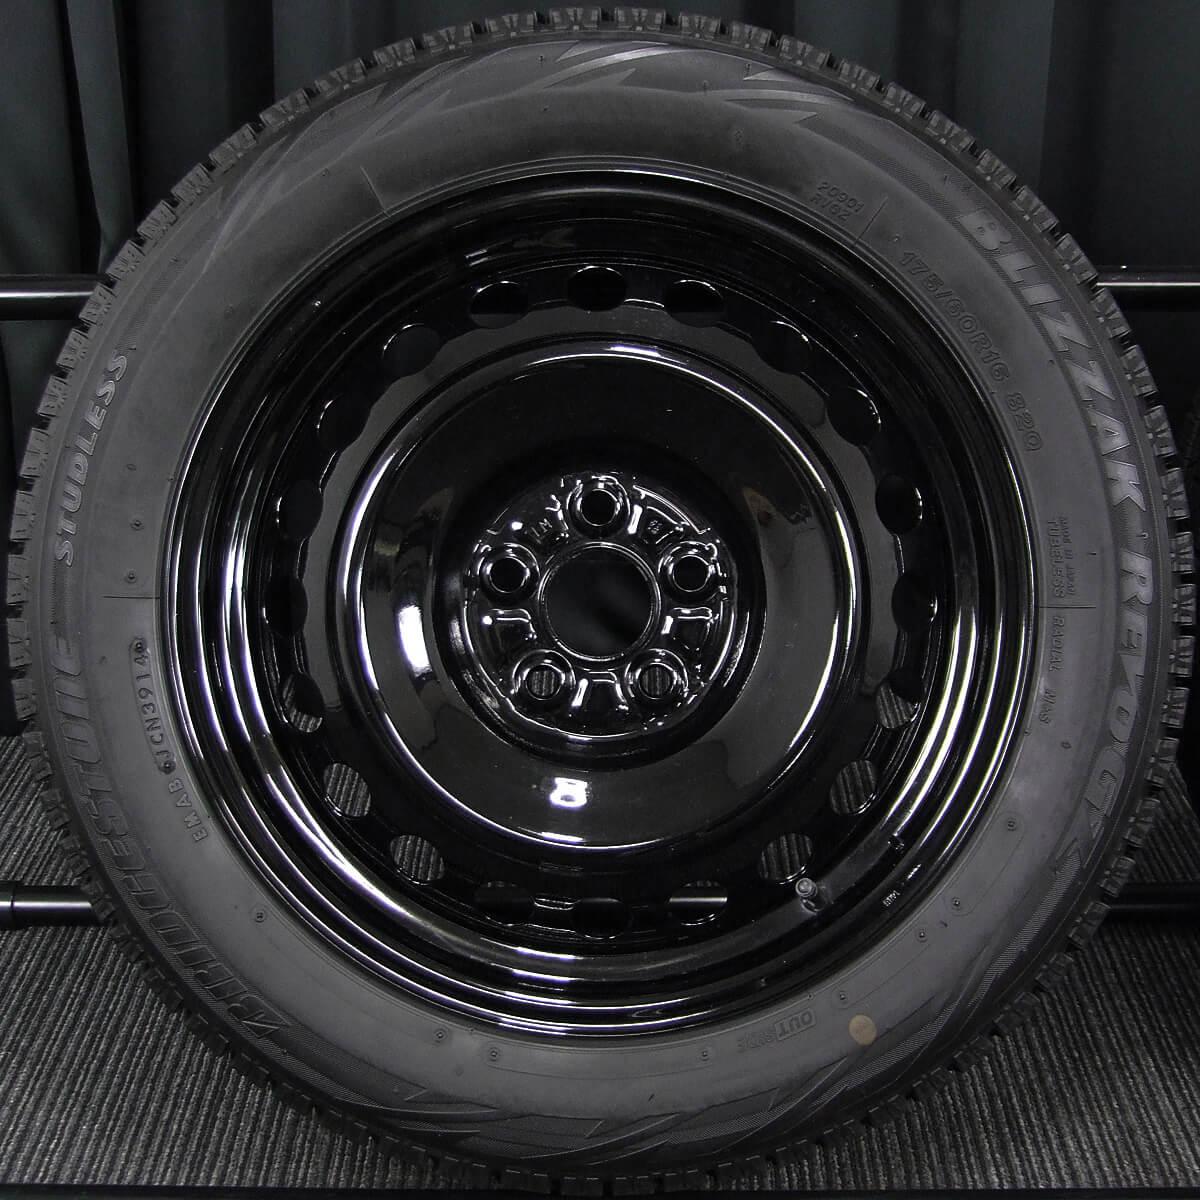 TOYOTA ラクティス / SUBARU トレジア 純正 ブラック BRIDGESTONE BLIZZAK REVO-GZ 175/60R16 4本SET